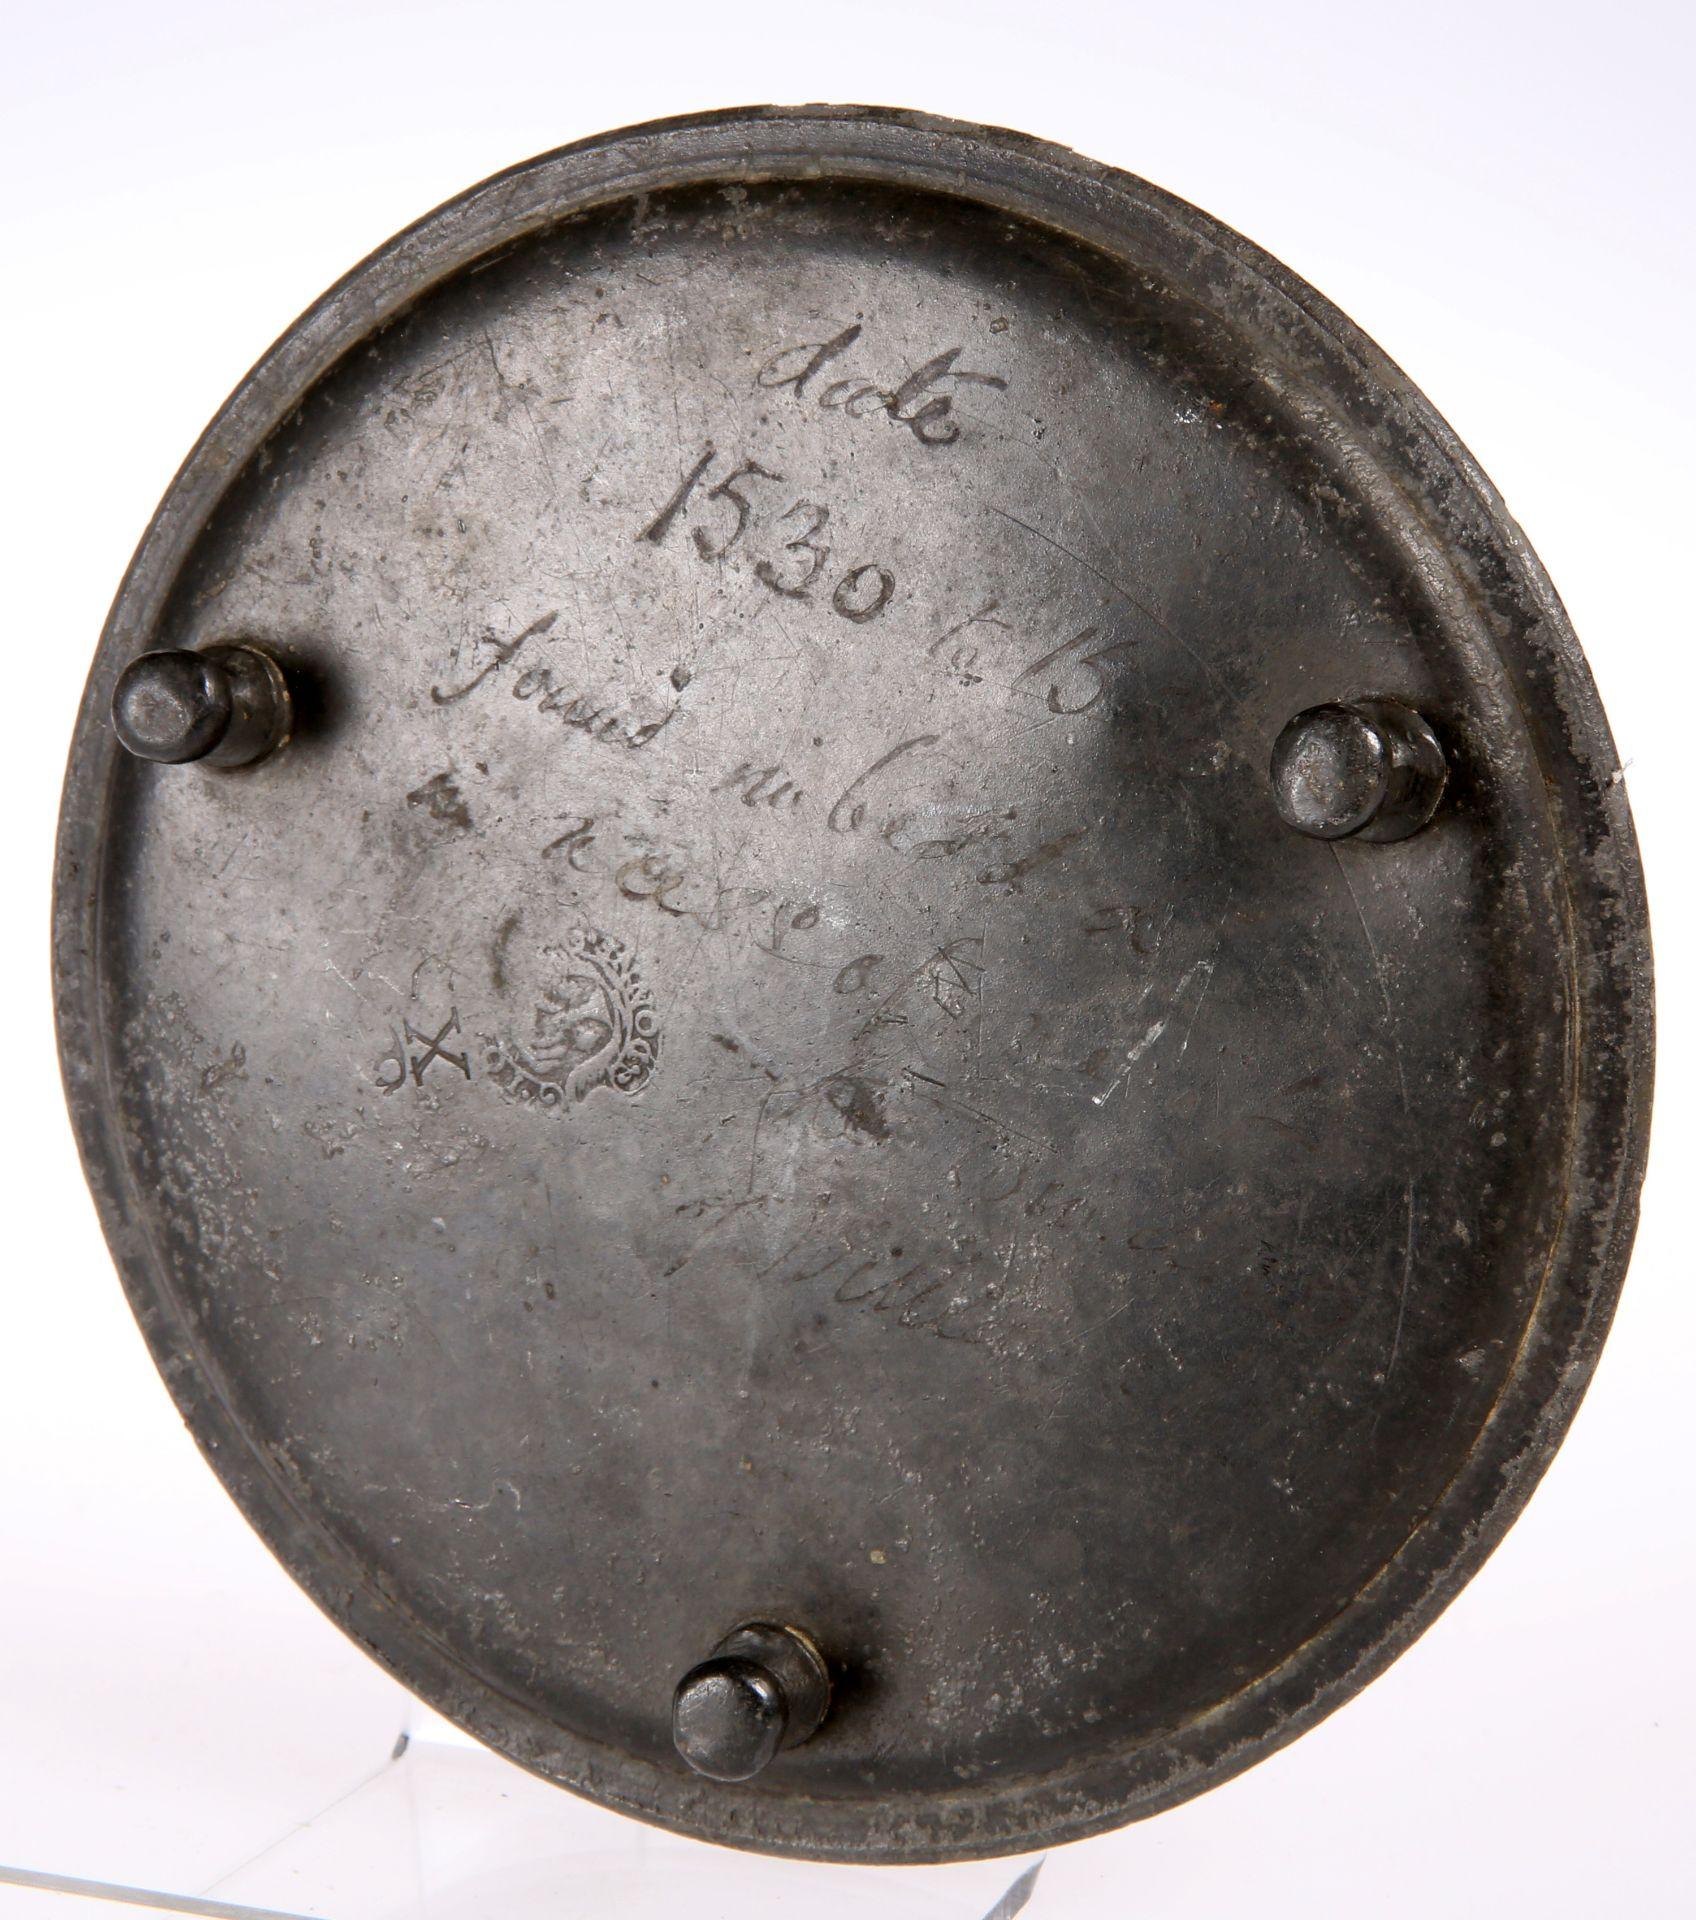 ~ A 17TH CENTURY PEWTER WAITER, bears London touchmark of Donne, engraved 'Willian', bears - Bild 2 aus 2